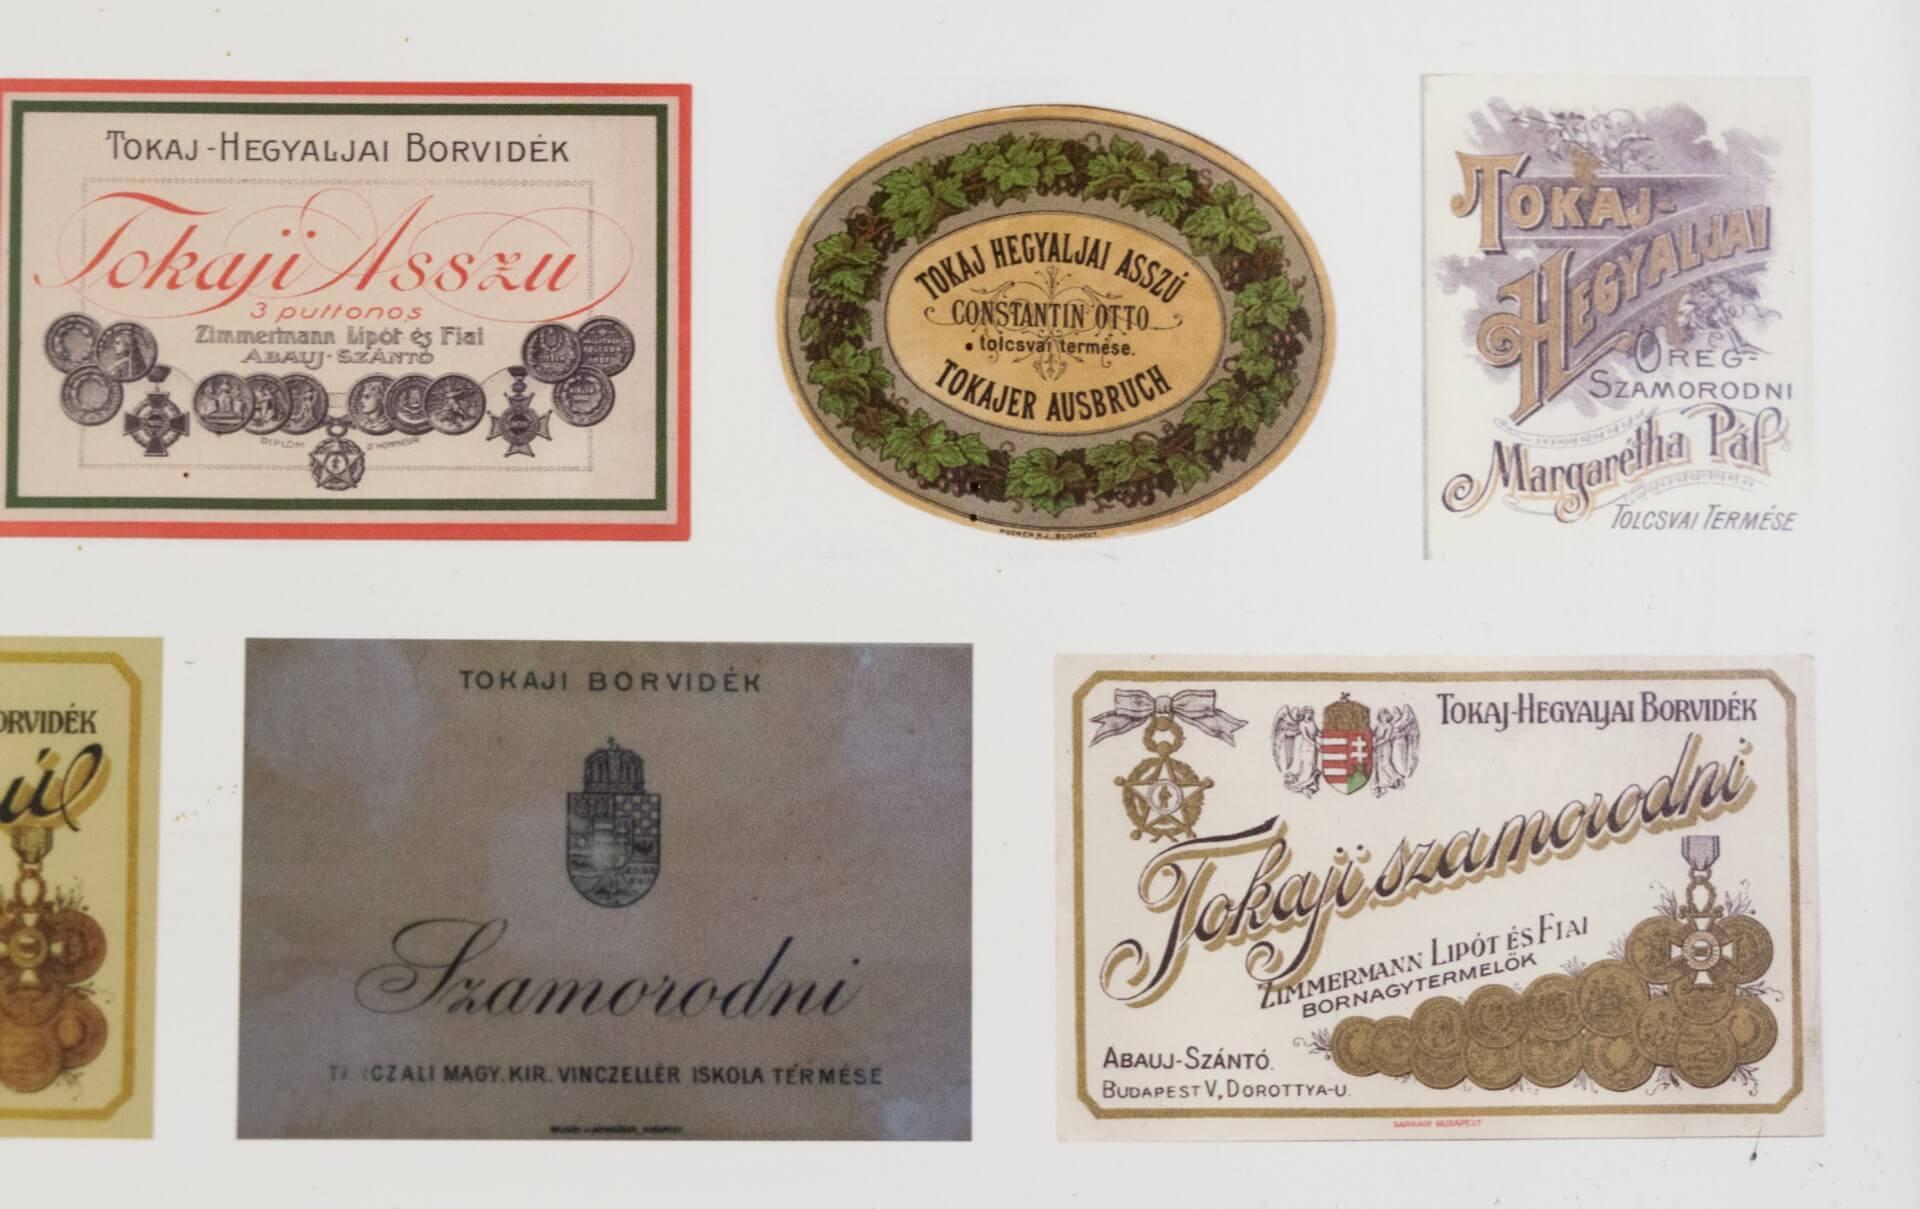 Historischer Tokajer Etiketten, Markthalle Budapest